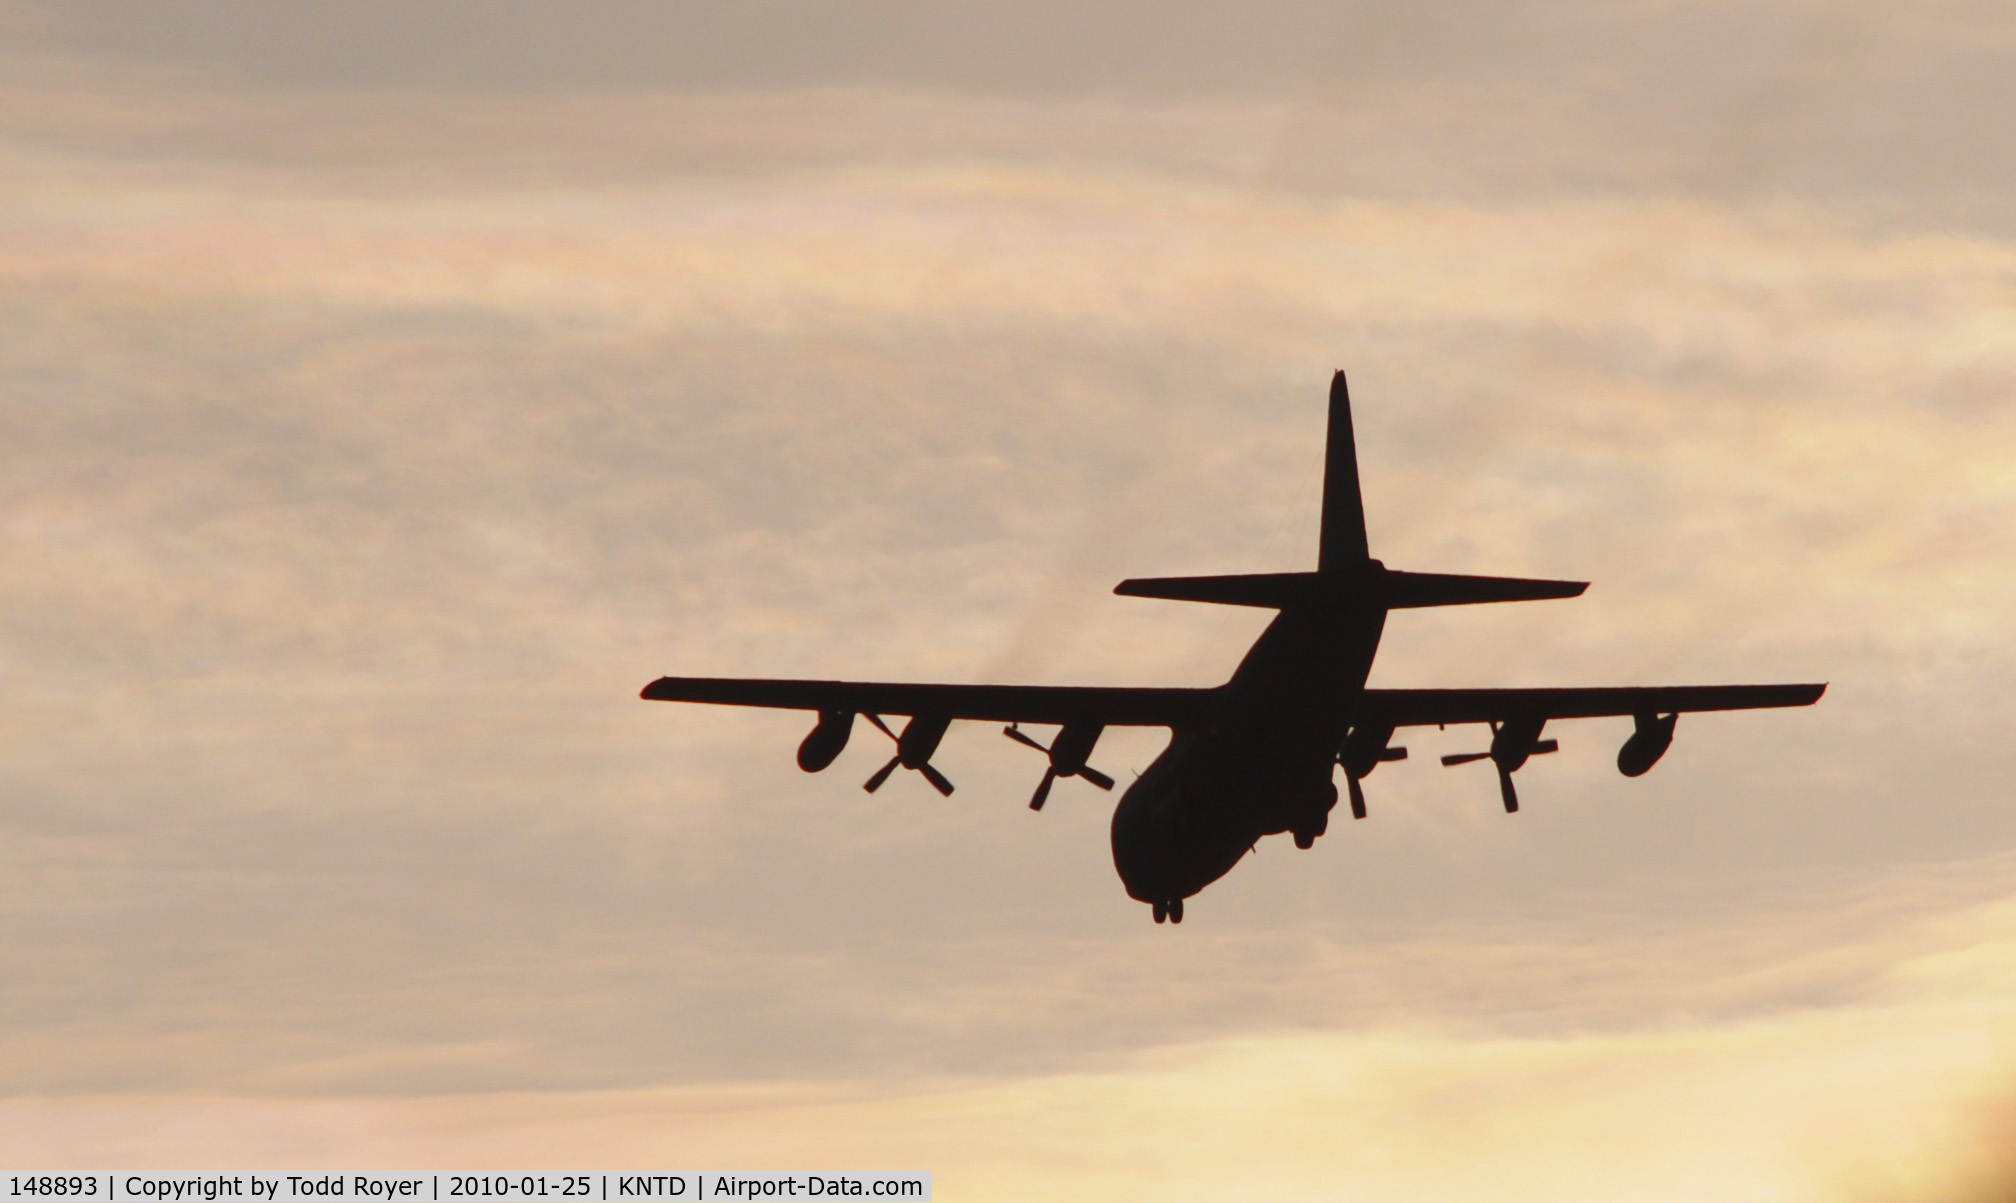 148893, 1961 Lockheed KC-130F Hercules C/N 282-3607, From the backyard